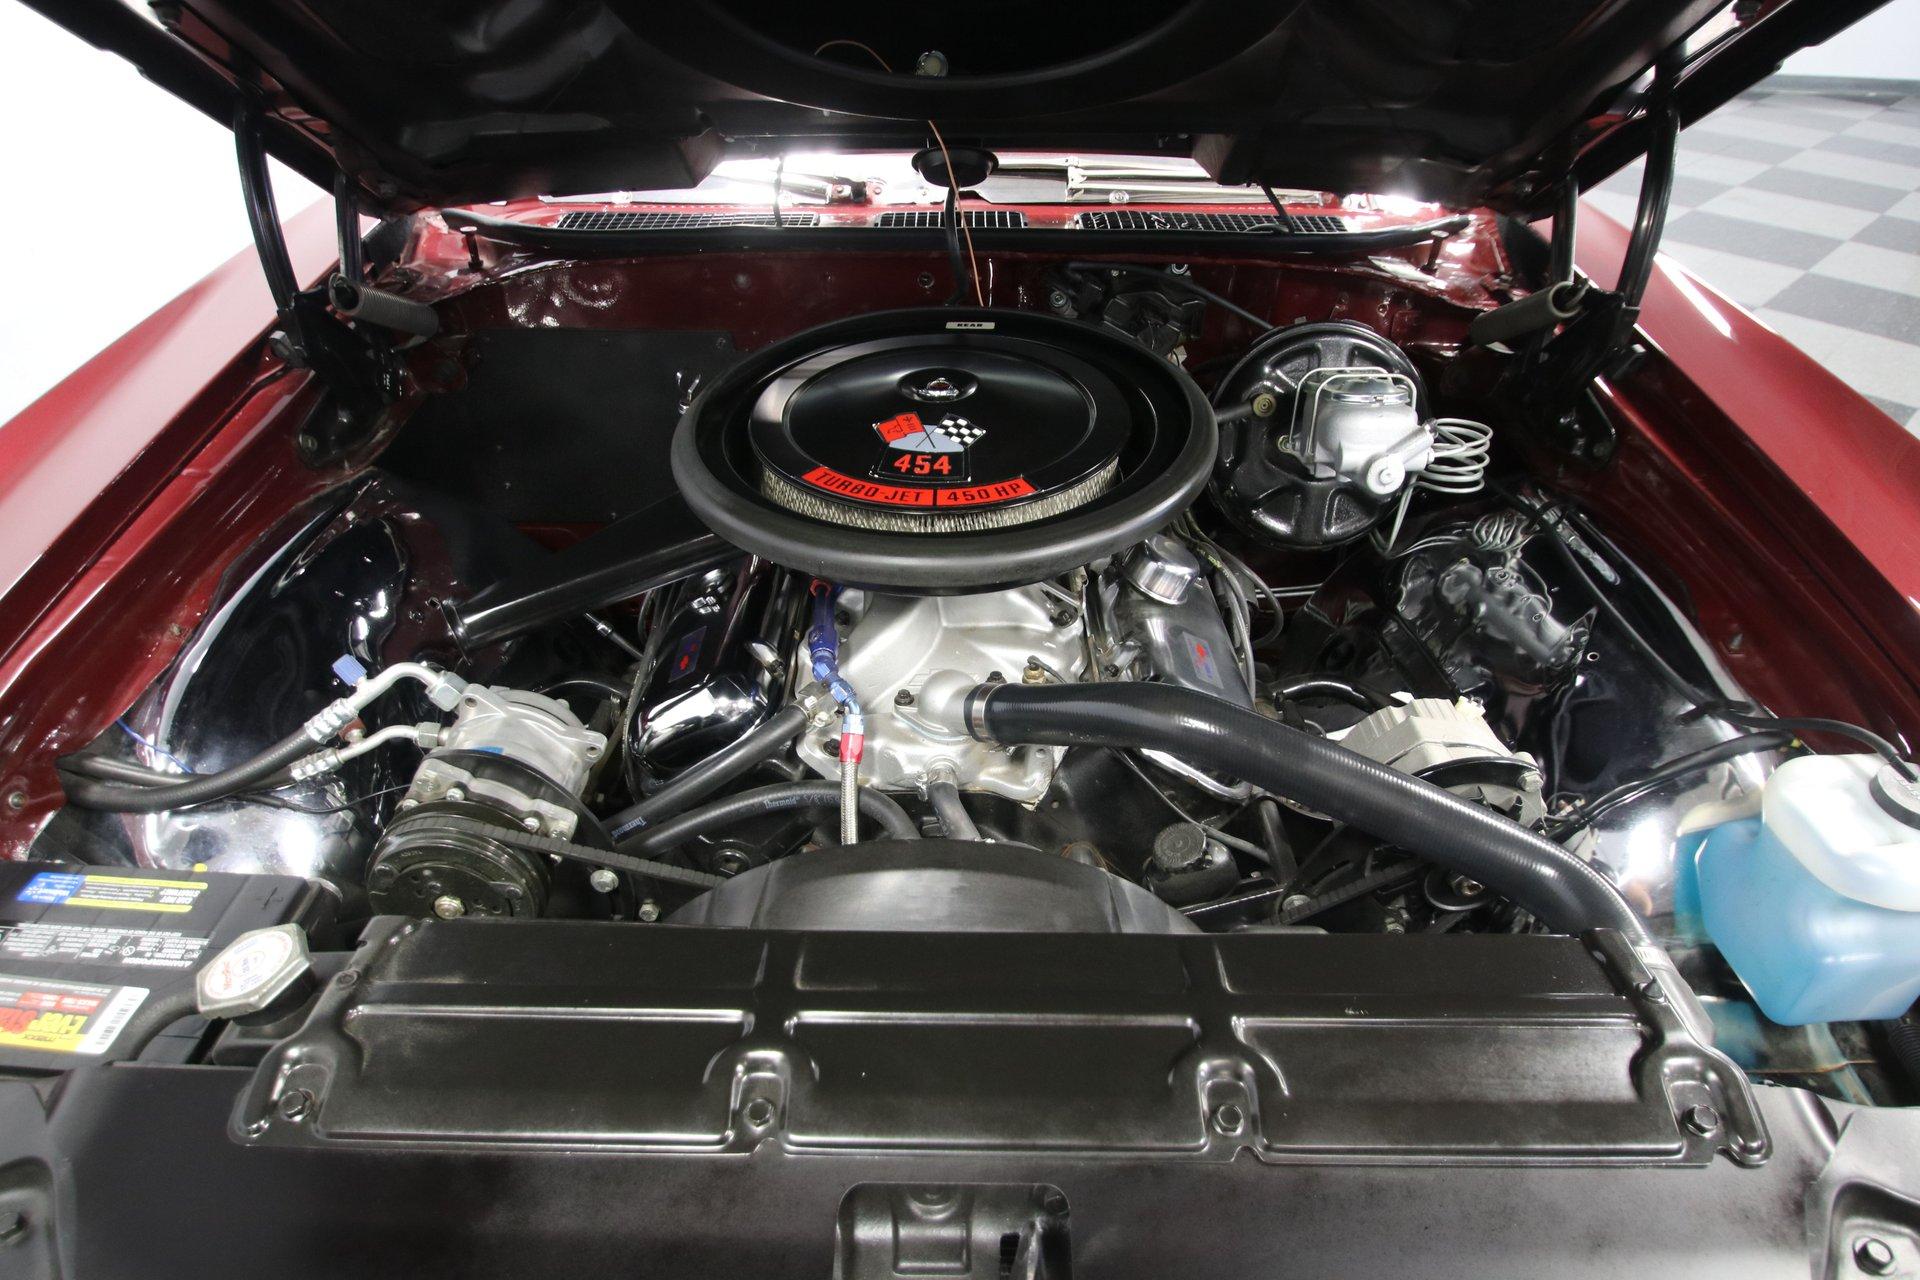 1970 chevrolet chevelle ss restomod convertible